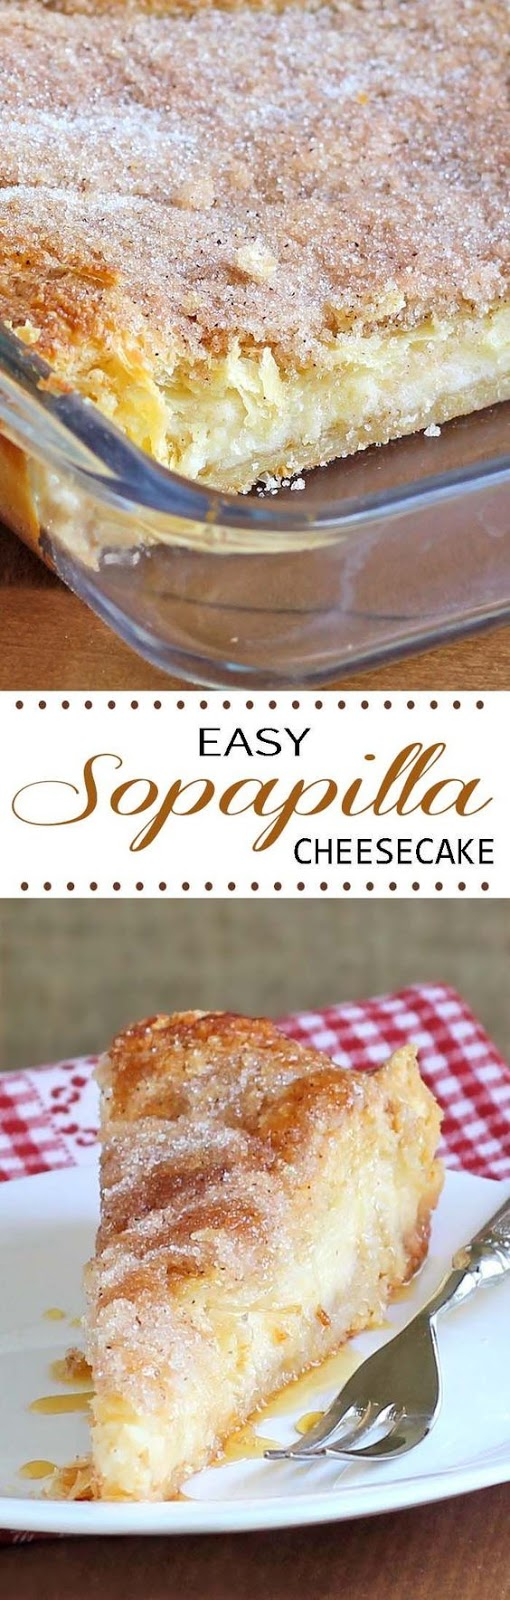 Easy Sopapilla Cheesecake Dessert